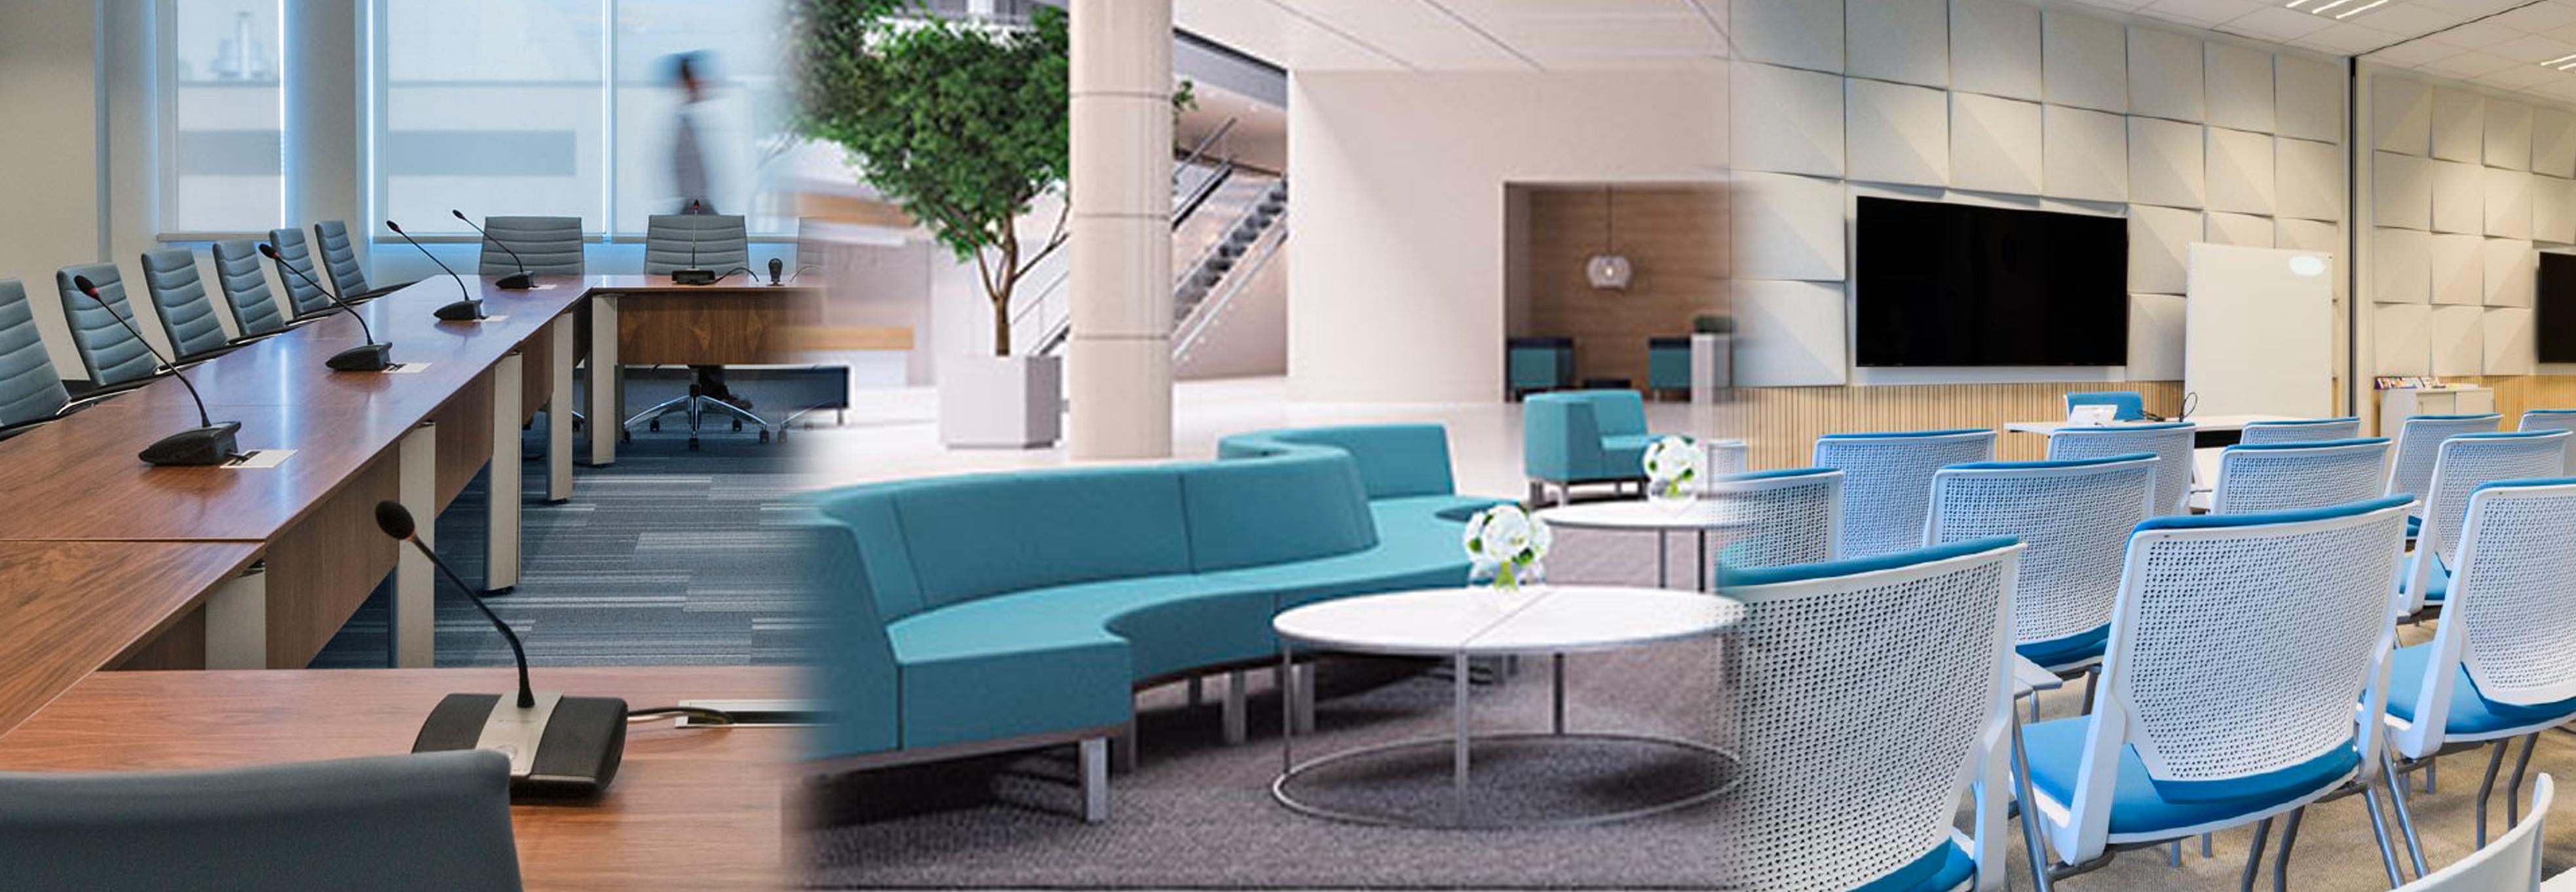 hospitality workspaces